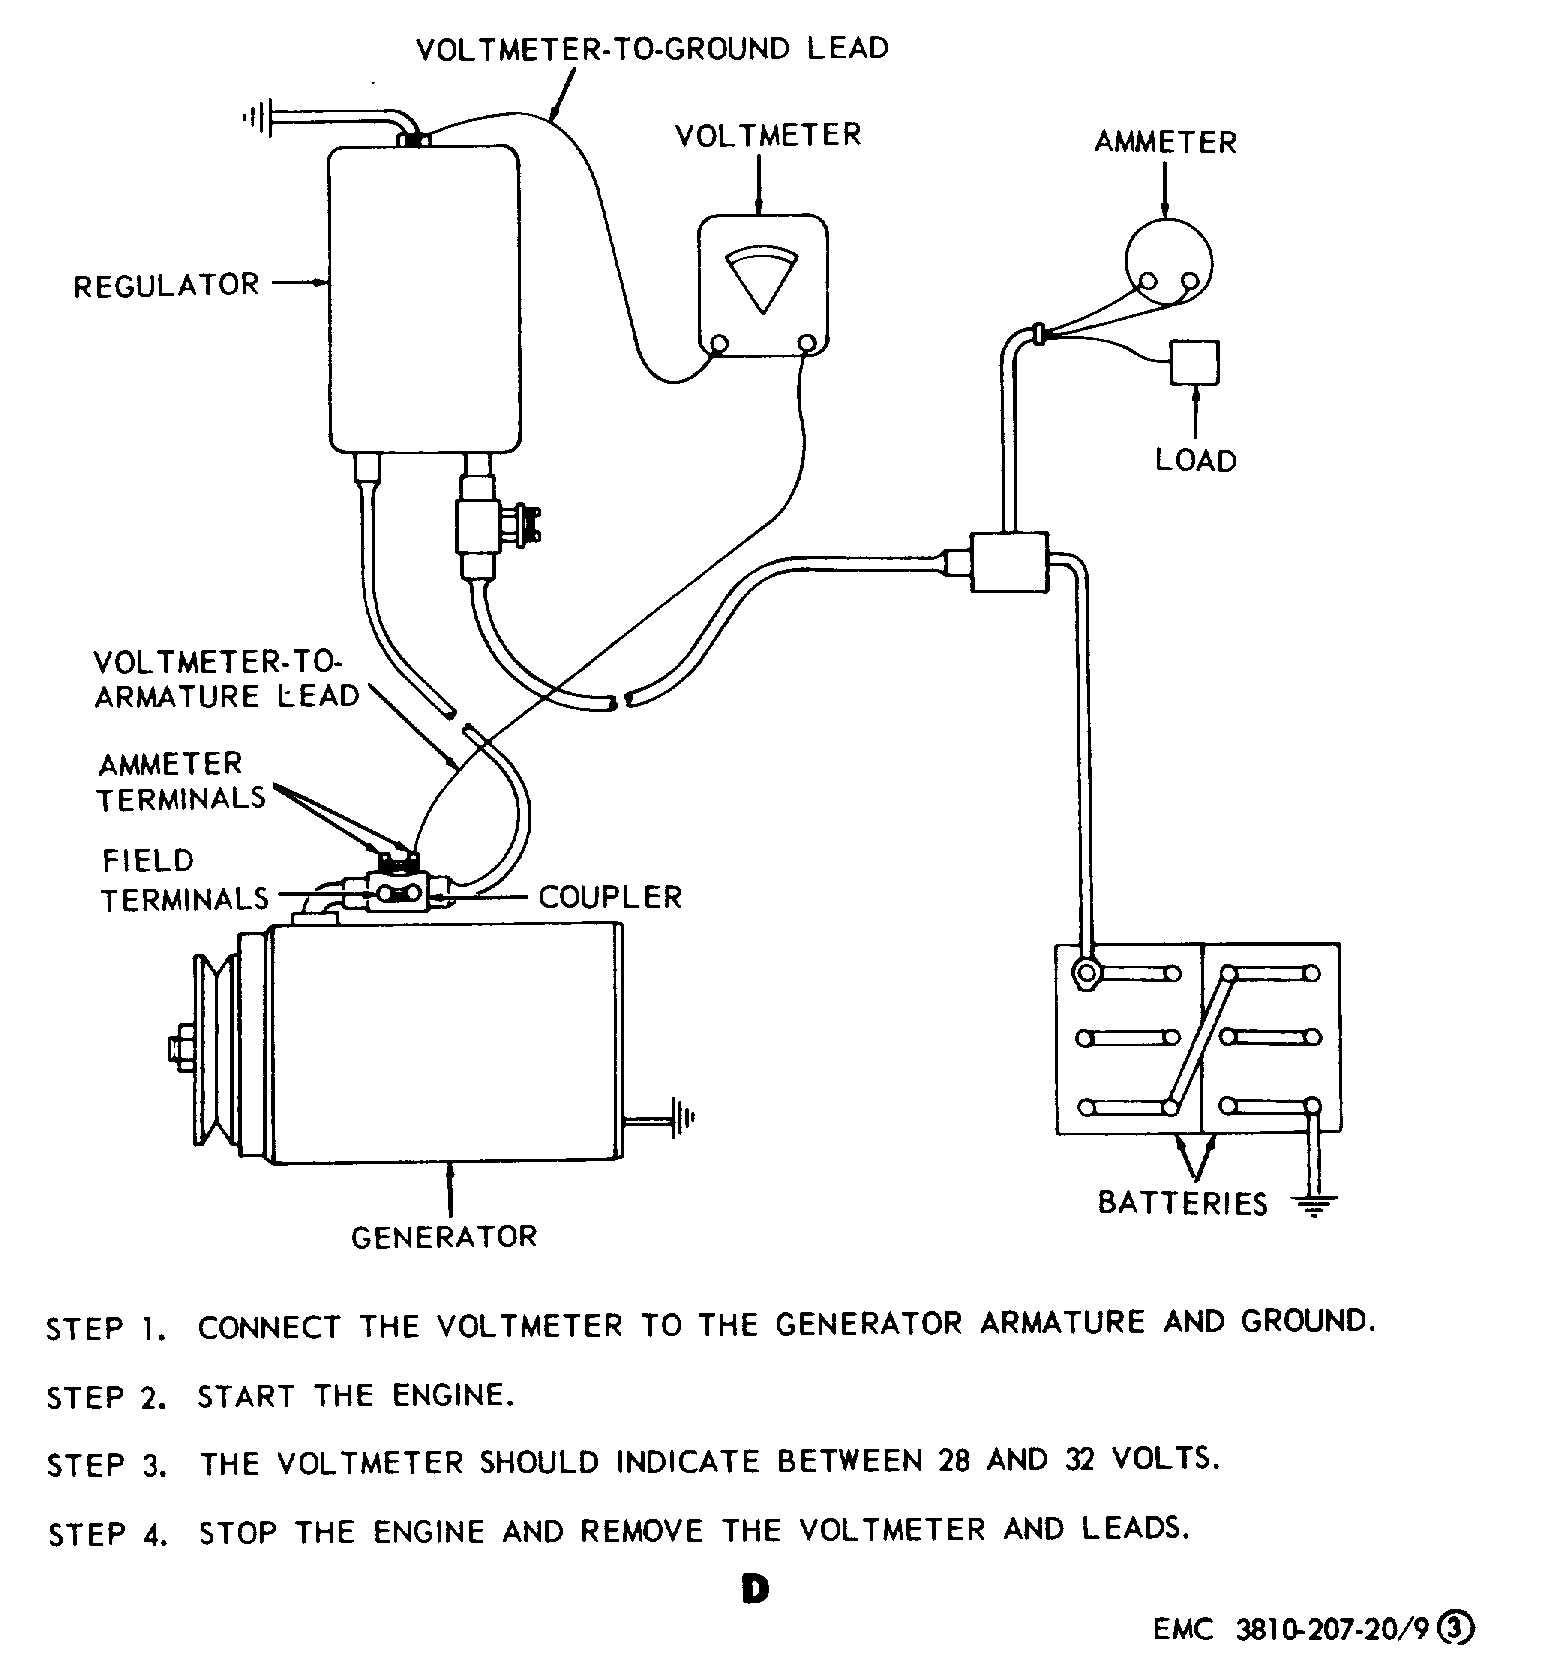 Command Kohler Kohler Engine Wiring Schematic